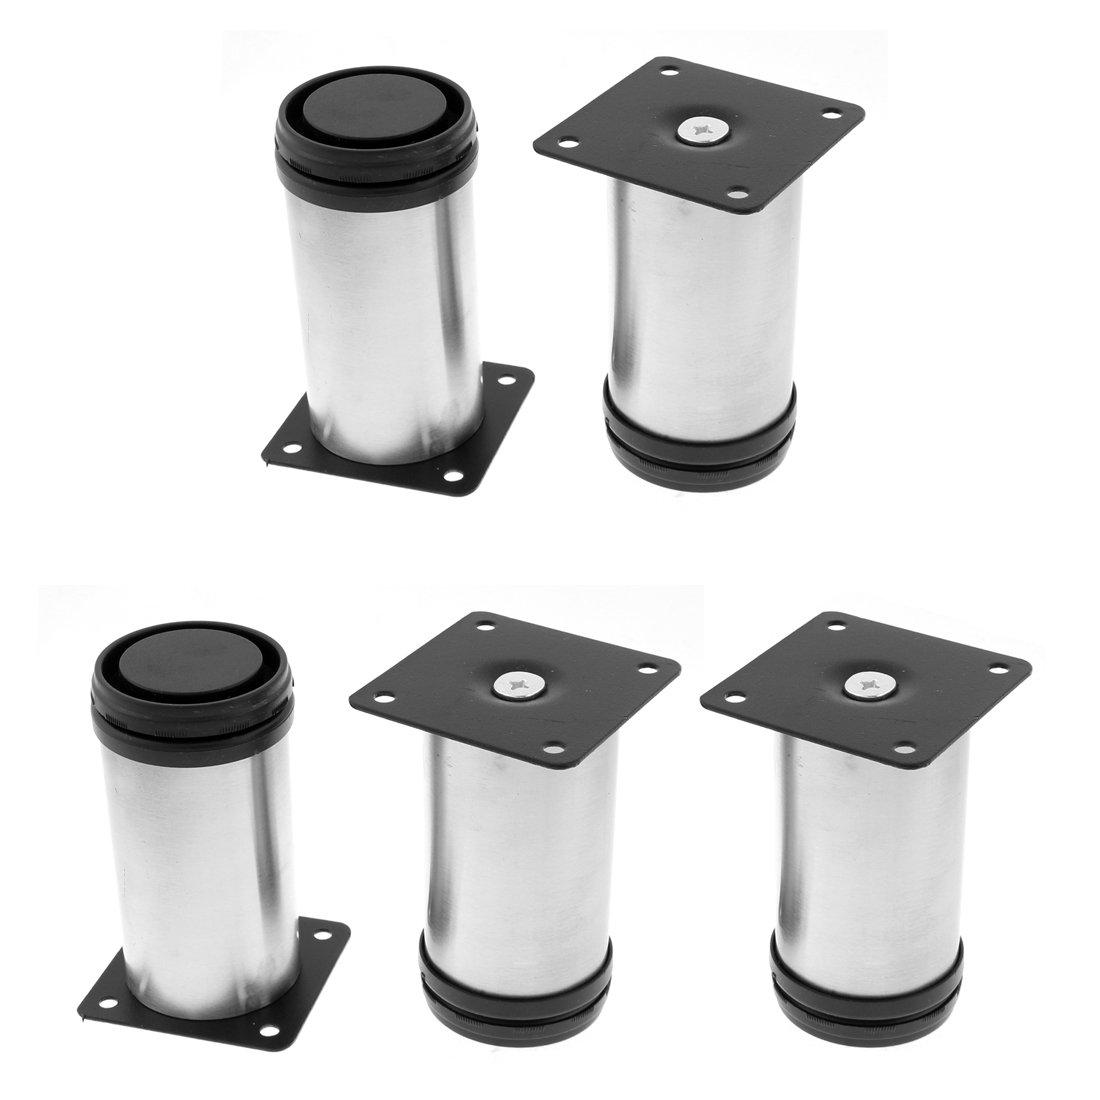 uxcell Furniture Cabinet 50mm x 100mm Cylinder Adjustable Plinth Leg 5pcs